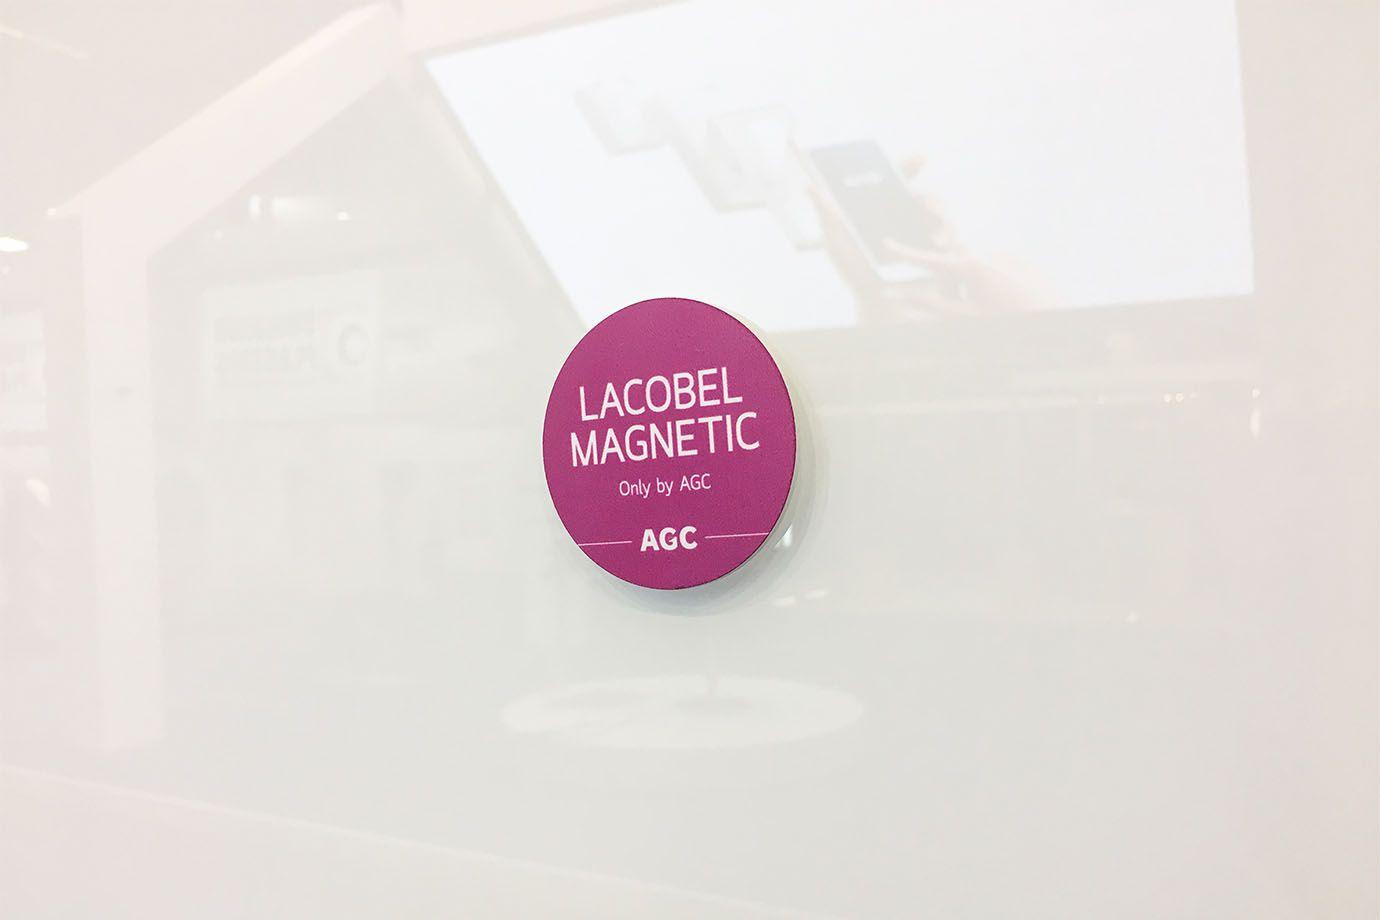 Magneet Lacobel Magnetic